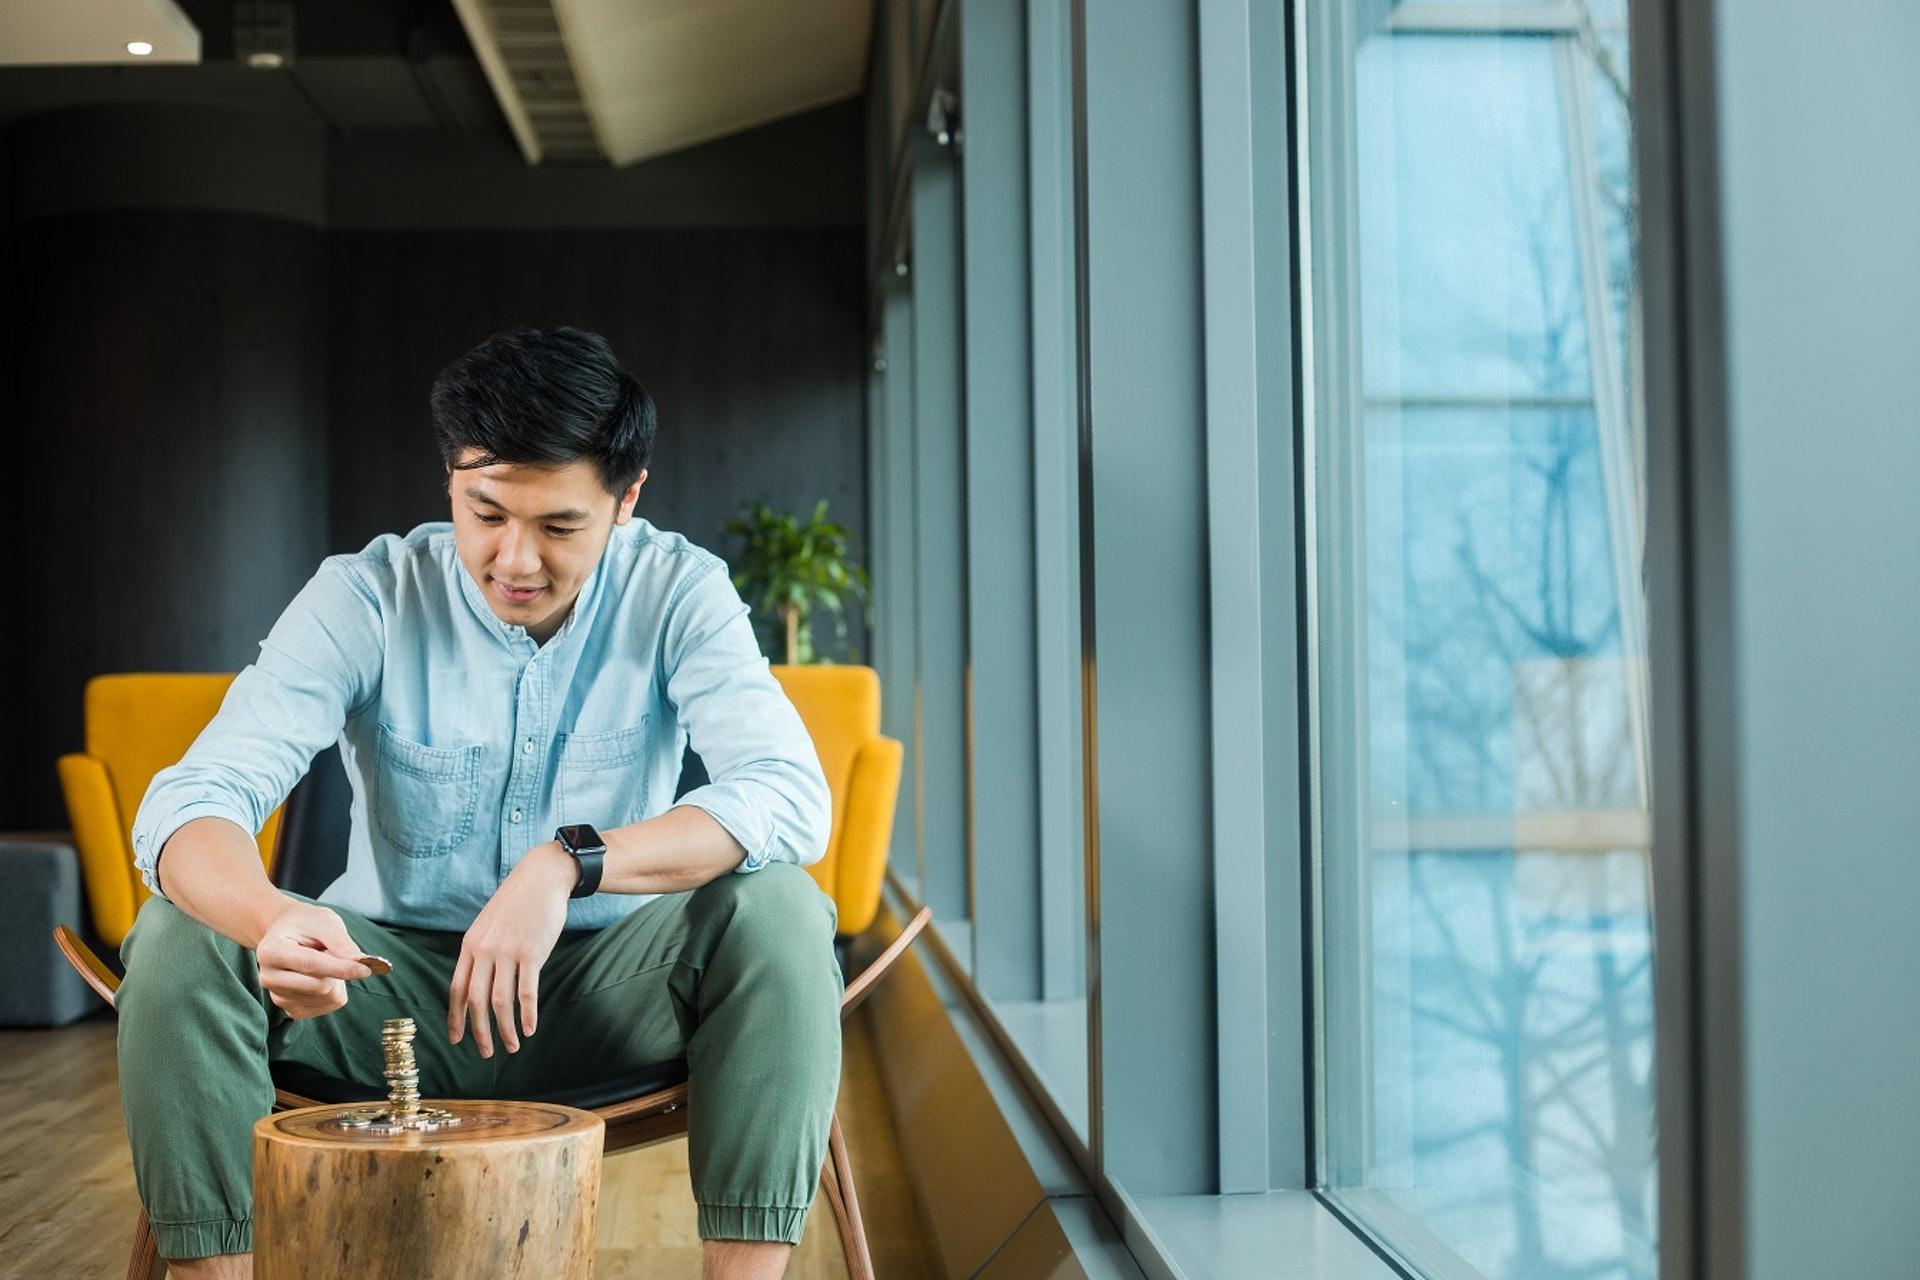 HEYCOINS聯合創辦人Adam Lau想透過HEYCOINS找回硬幣的價值。﹝吳煒豪攝﹞